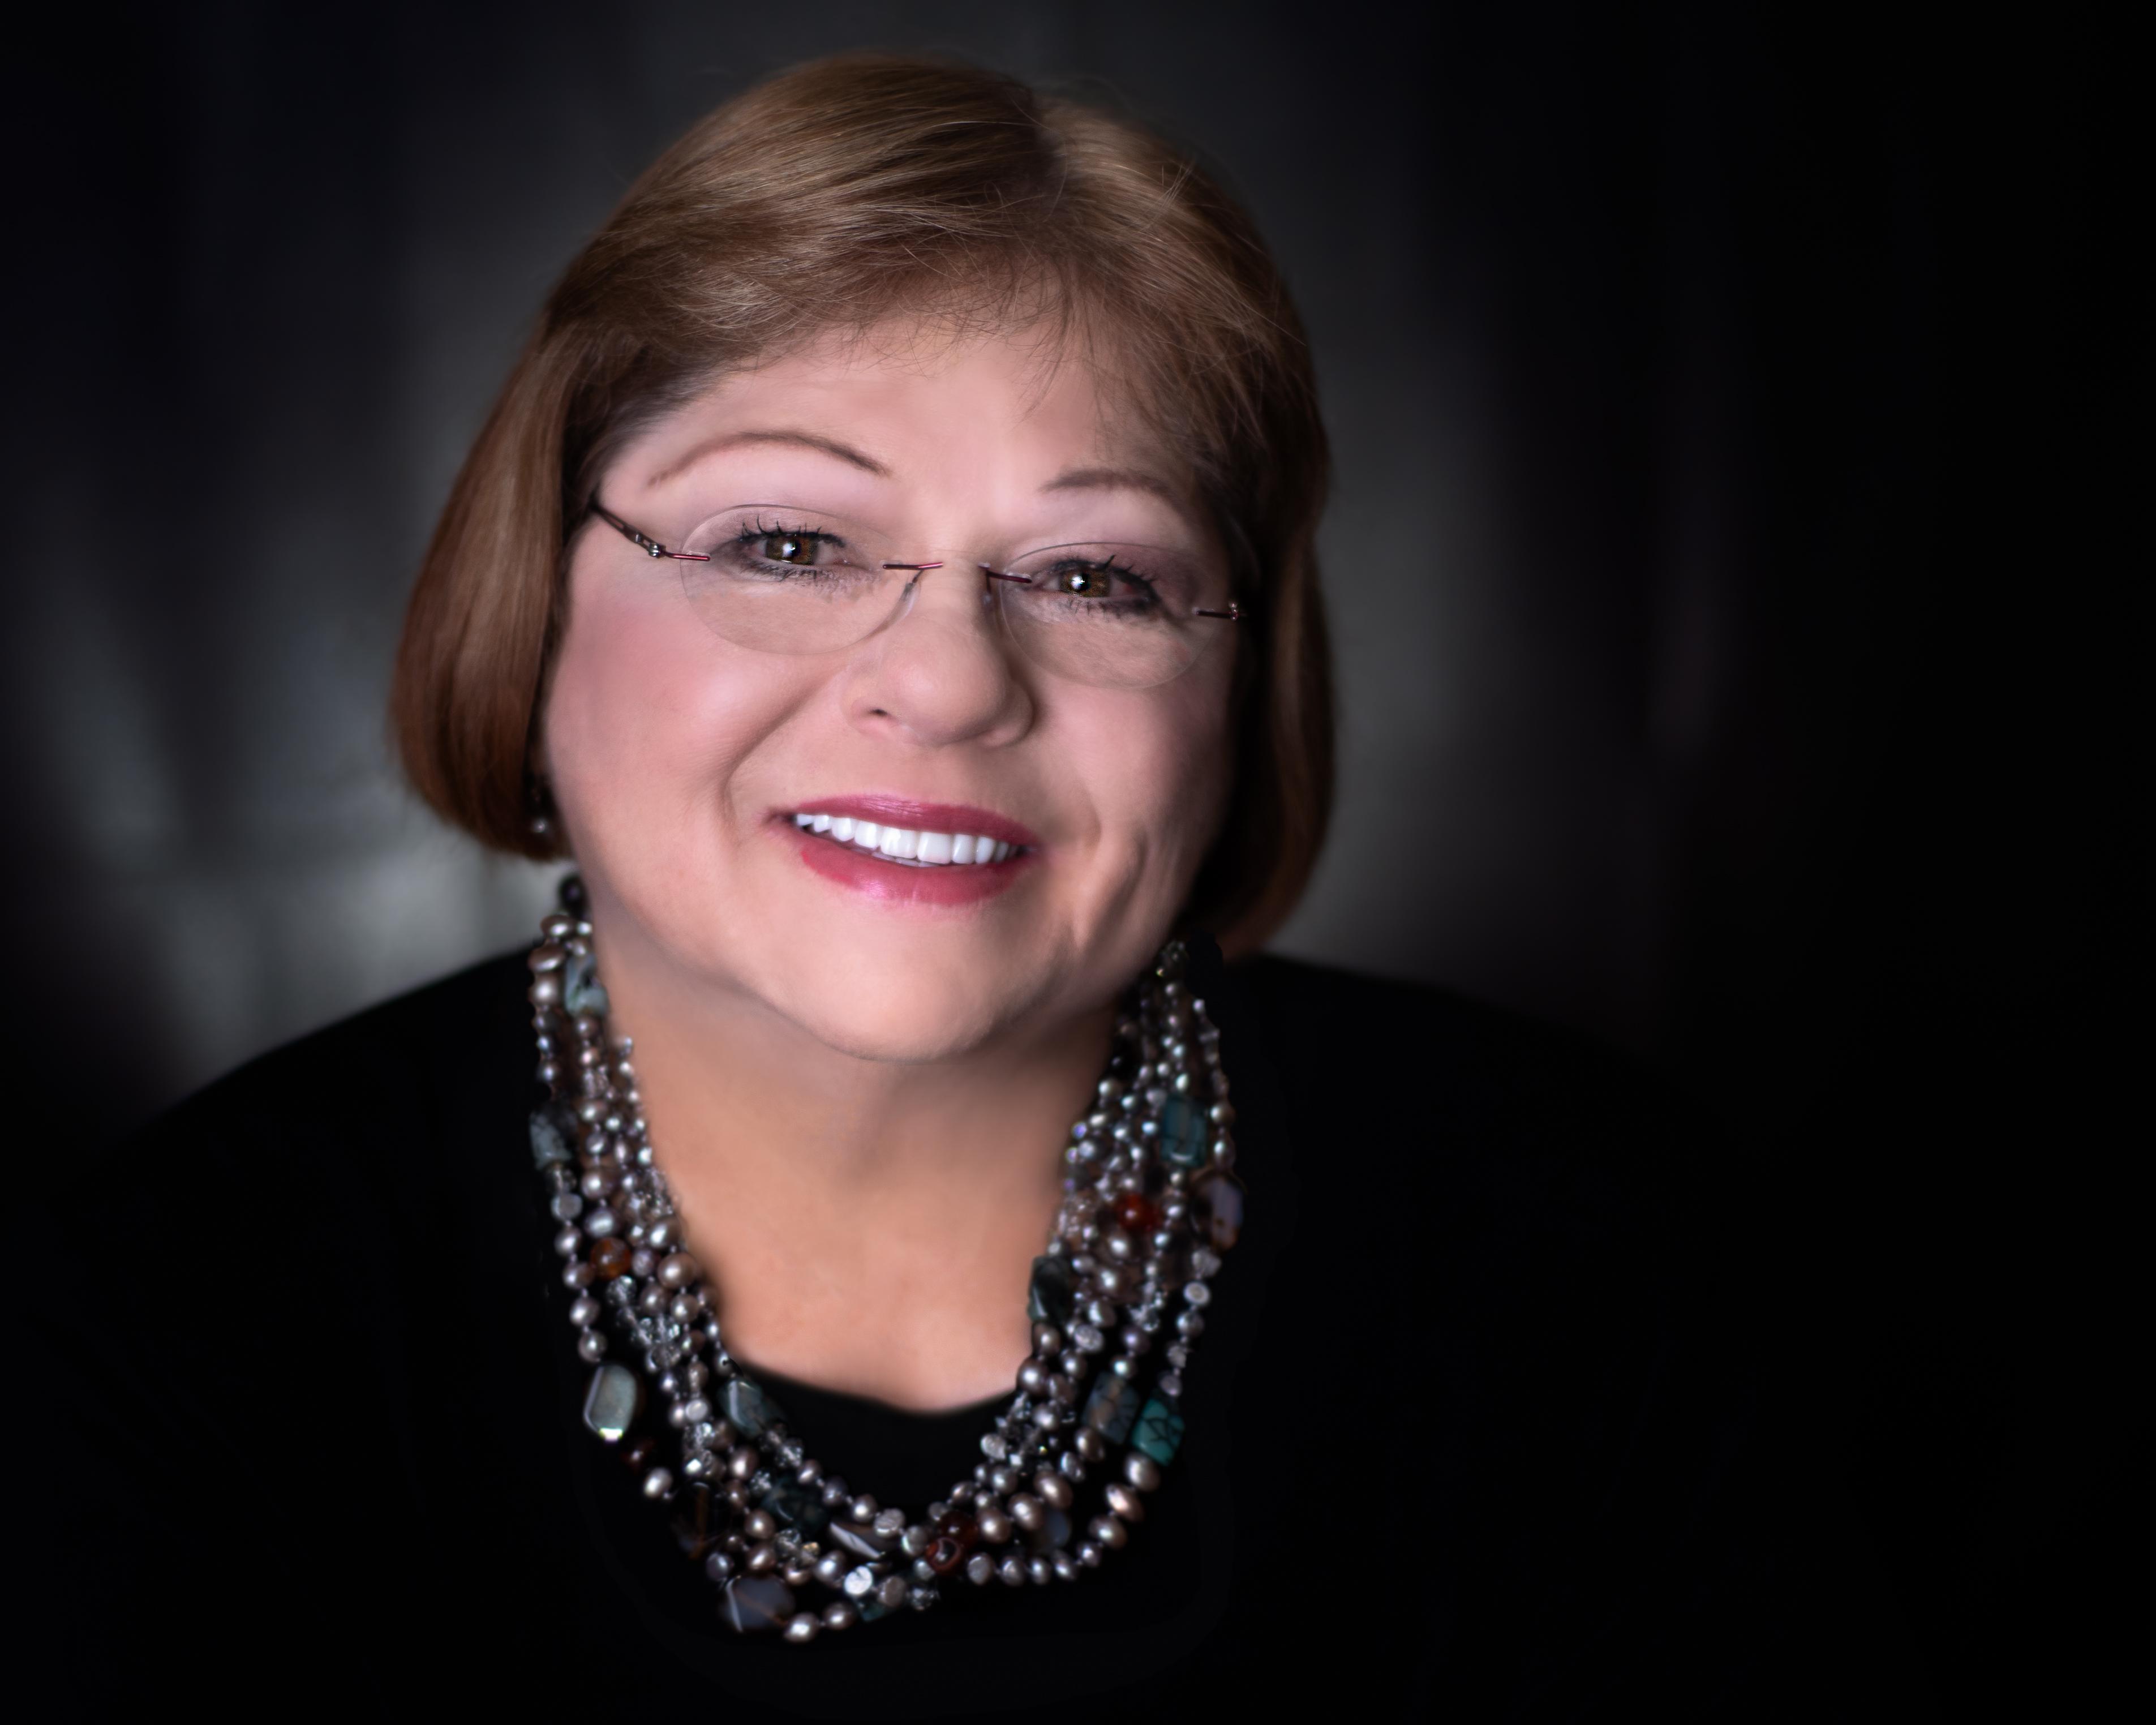 Rosemary-Coates-Reshoring-Institute-photo